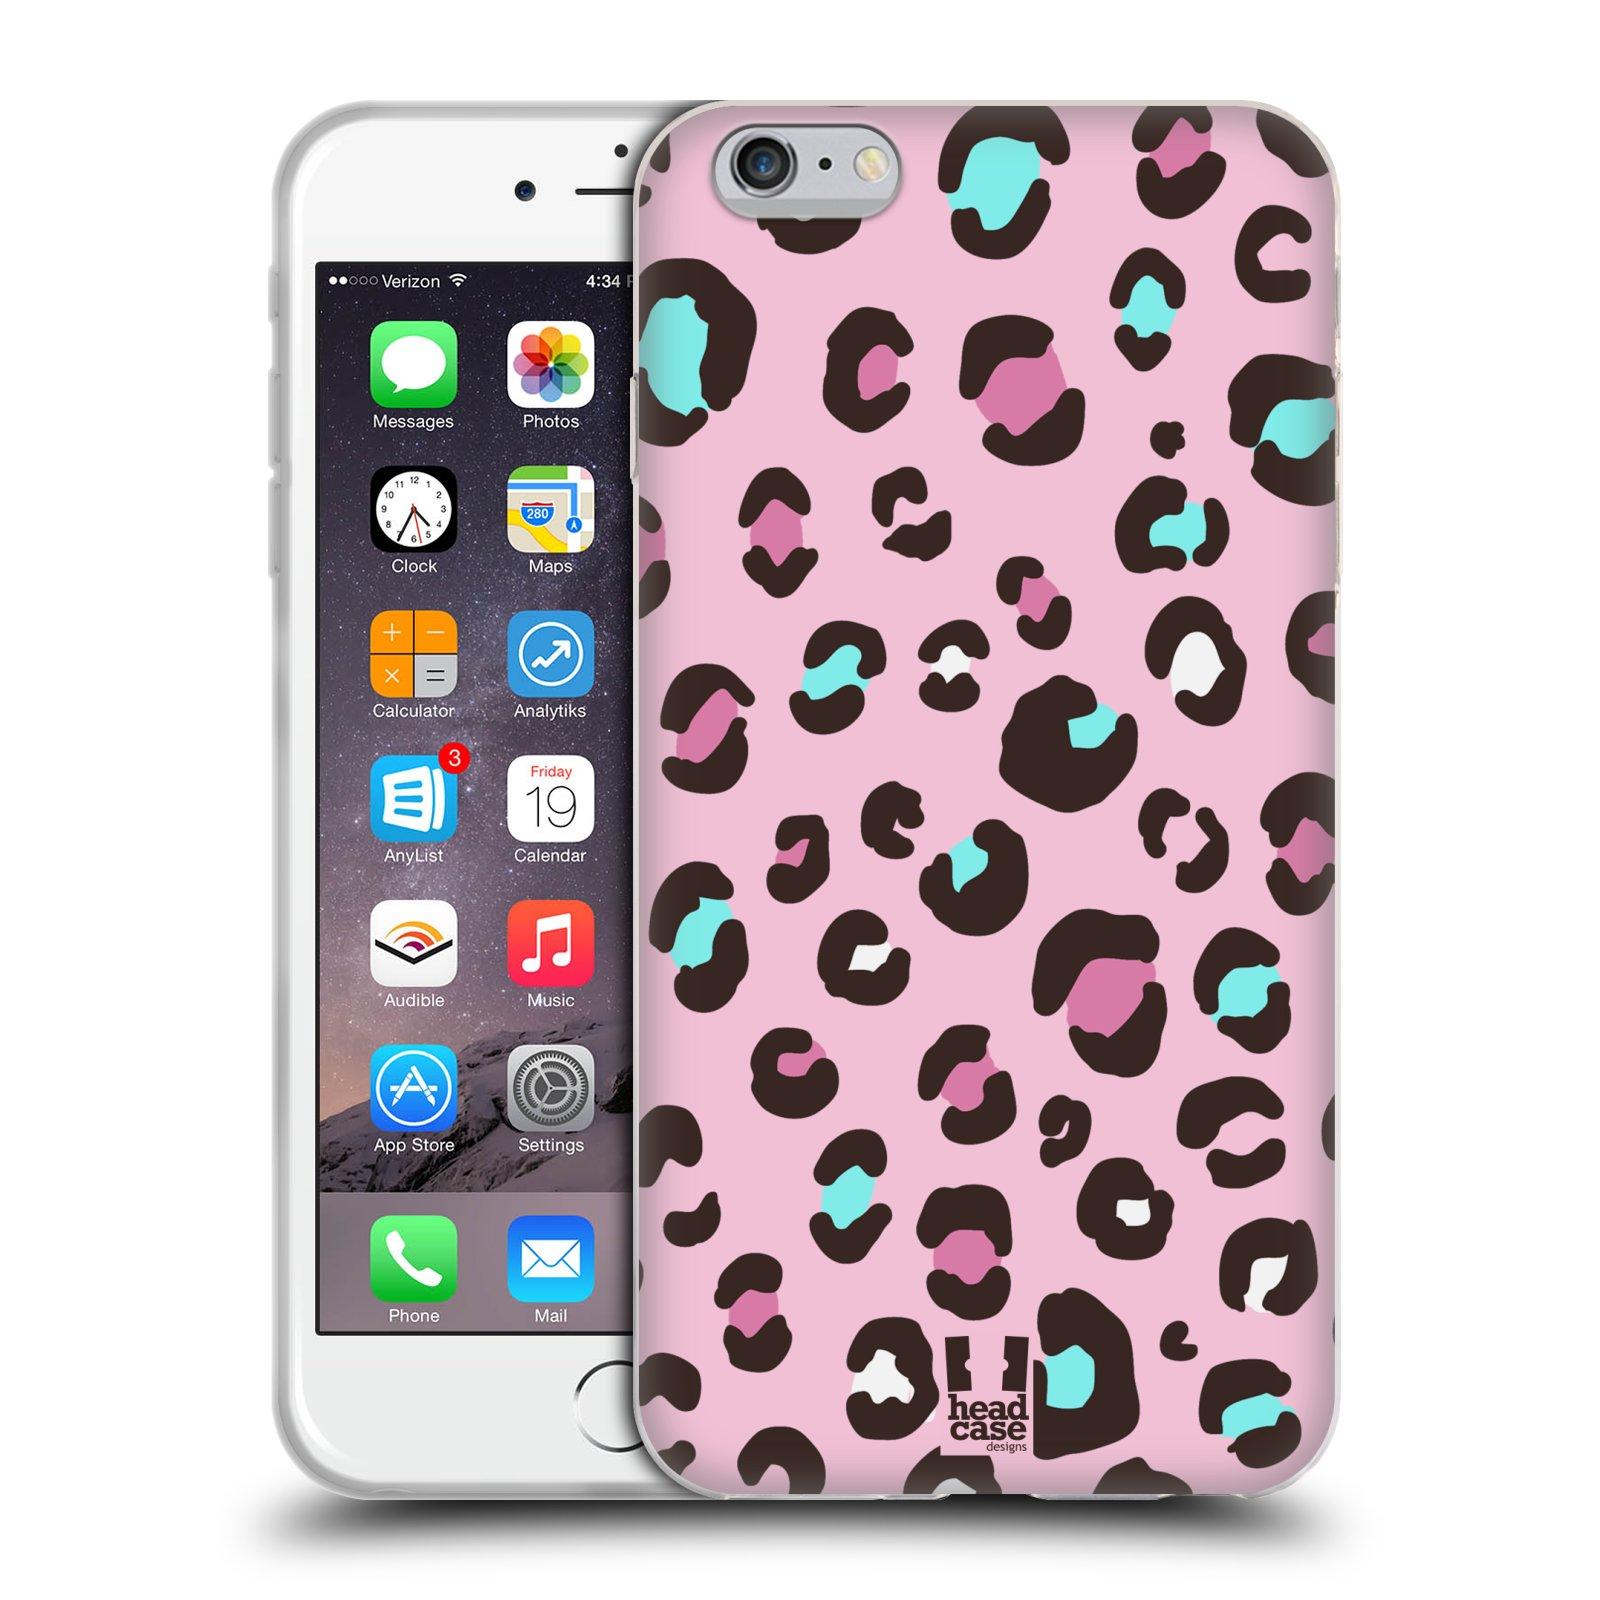 HEAD CASE silikonový obal na mobil Apple Iphone 6 PLUS/ 6S PLUS vzor Divočina zvíře 2 růžový MIX